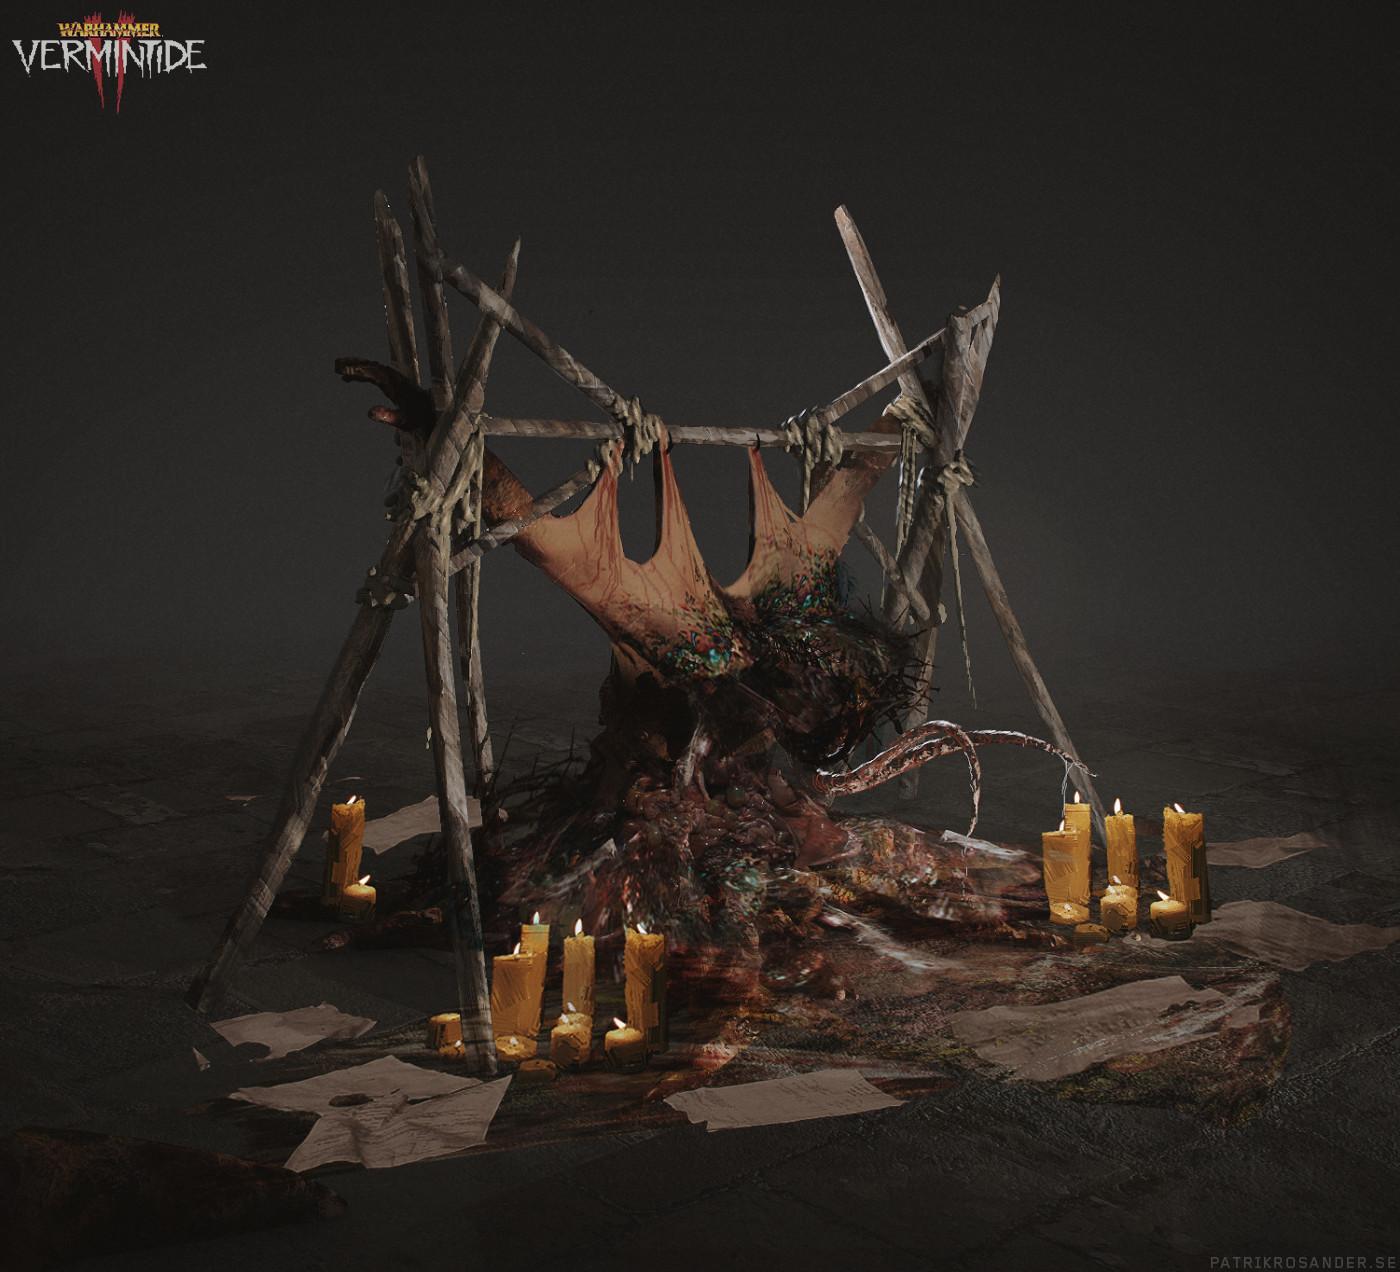 Patrik rosander convocation of decay ceremony 01